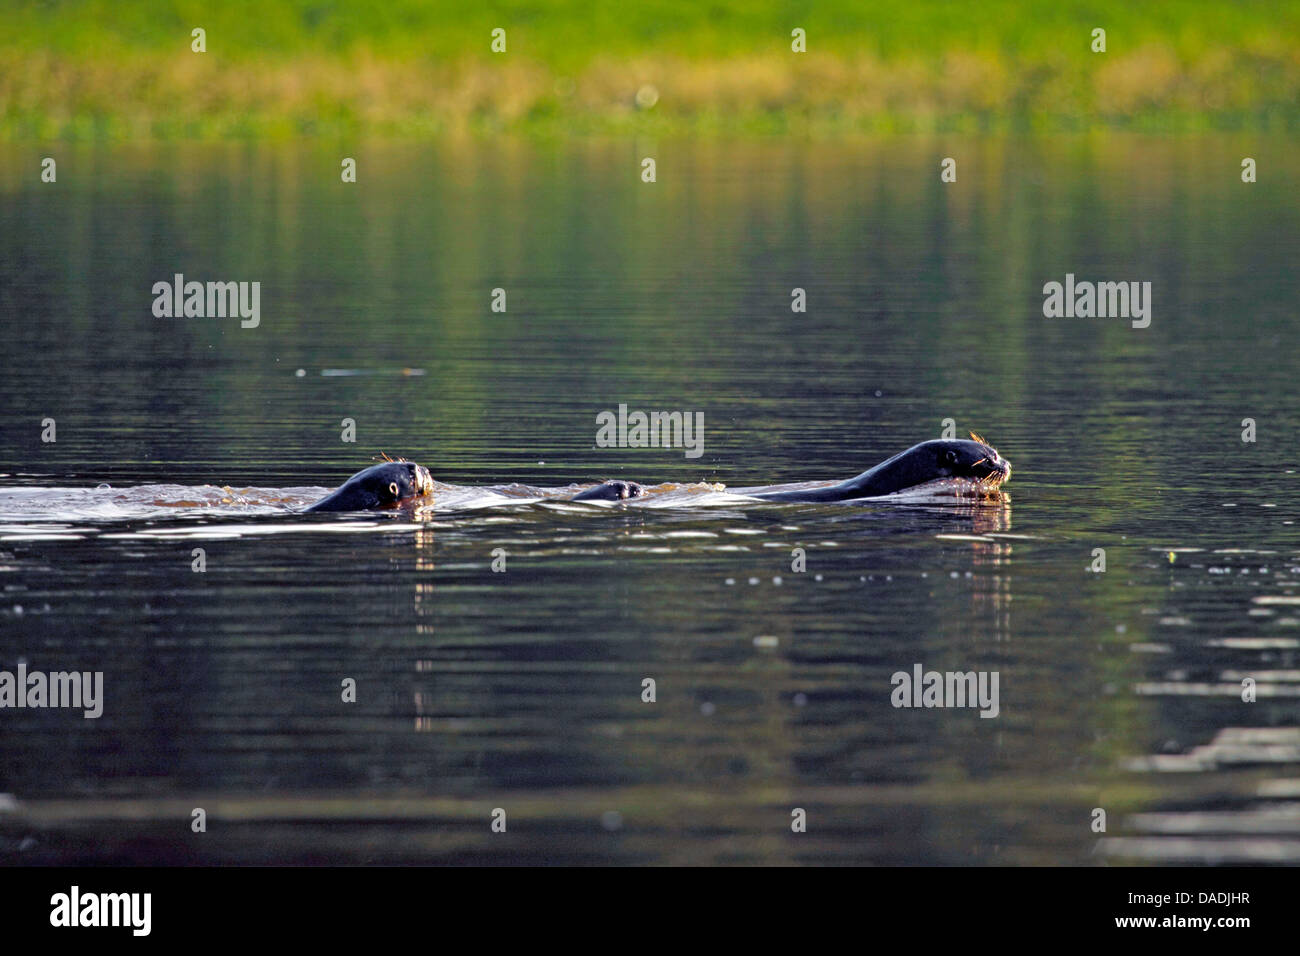 giant otter (Pteronura brasiliensis), family swimming, Peru, Loreto, Pacaya Samiria National Park Stock Photo